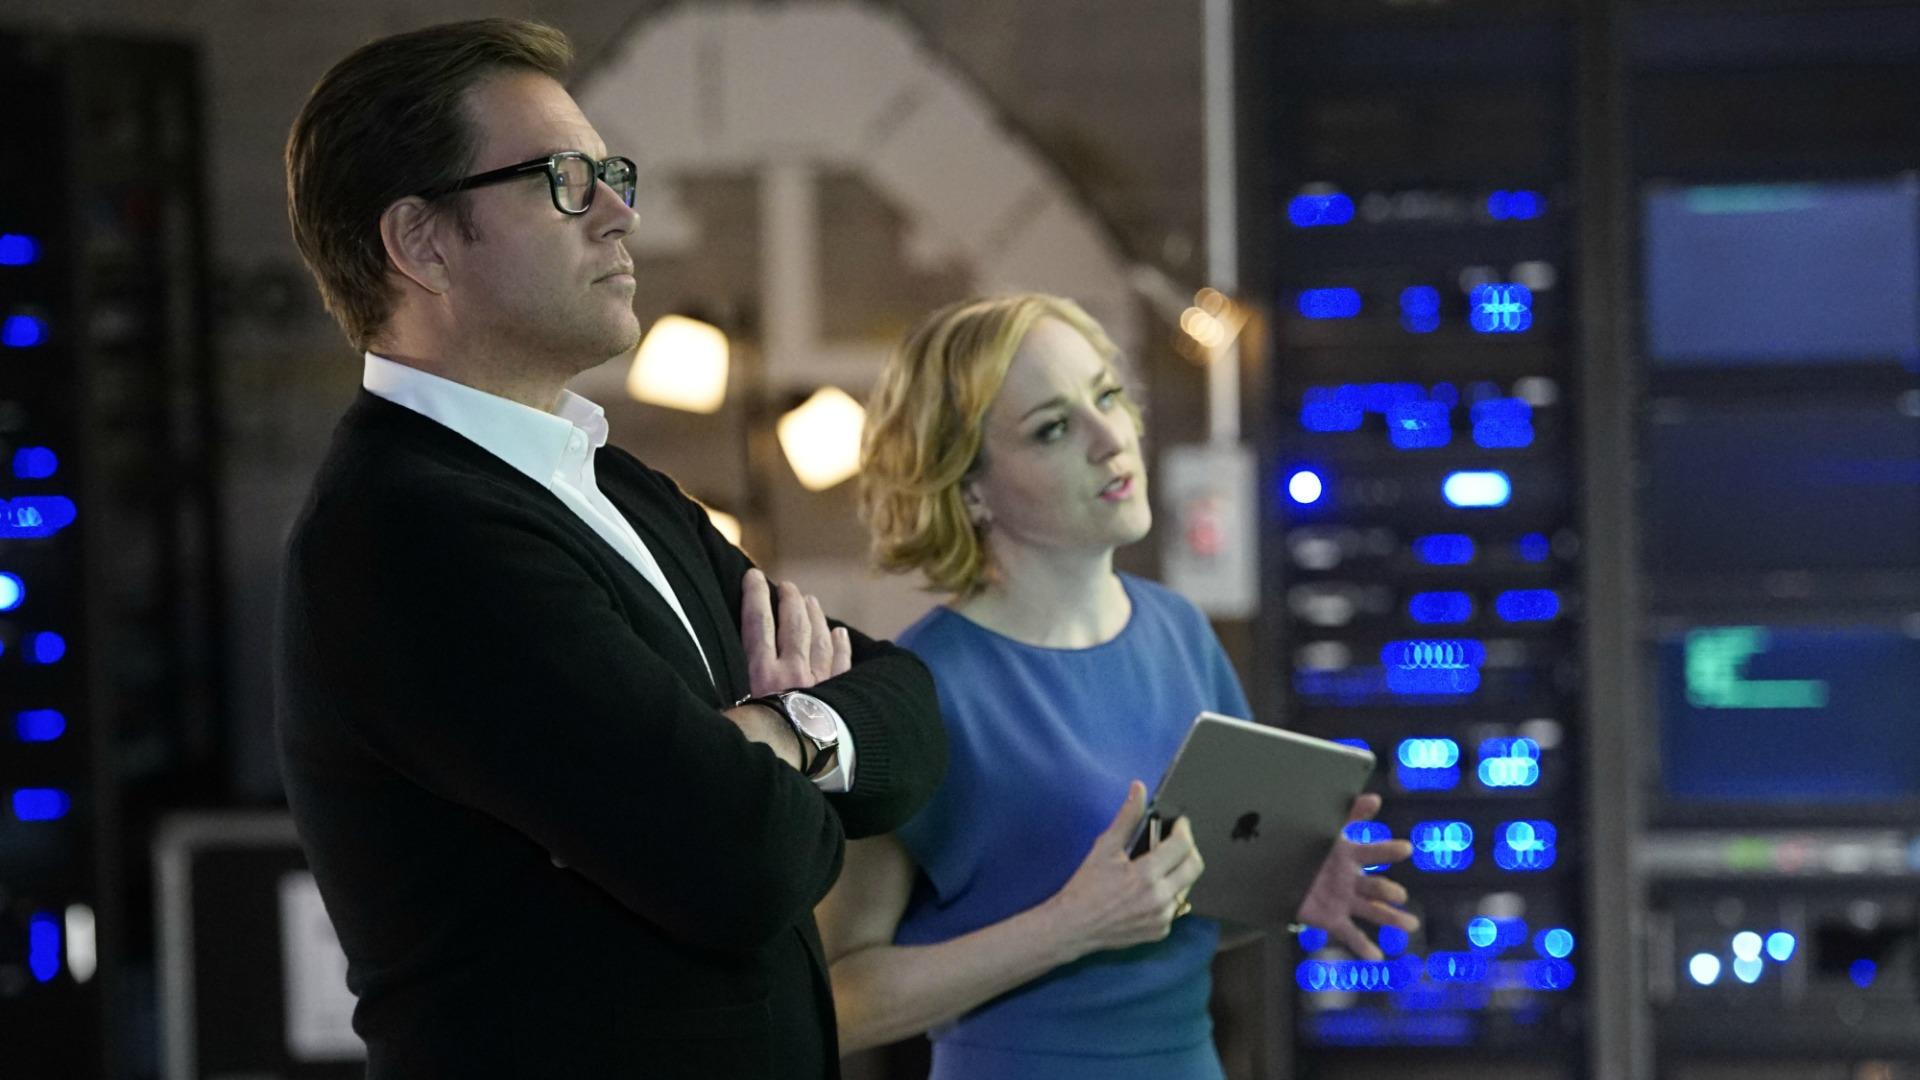 Dr. Jason Bull and Marissa Morgan explore new possibilities.